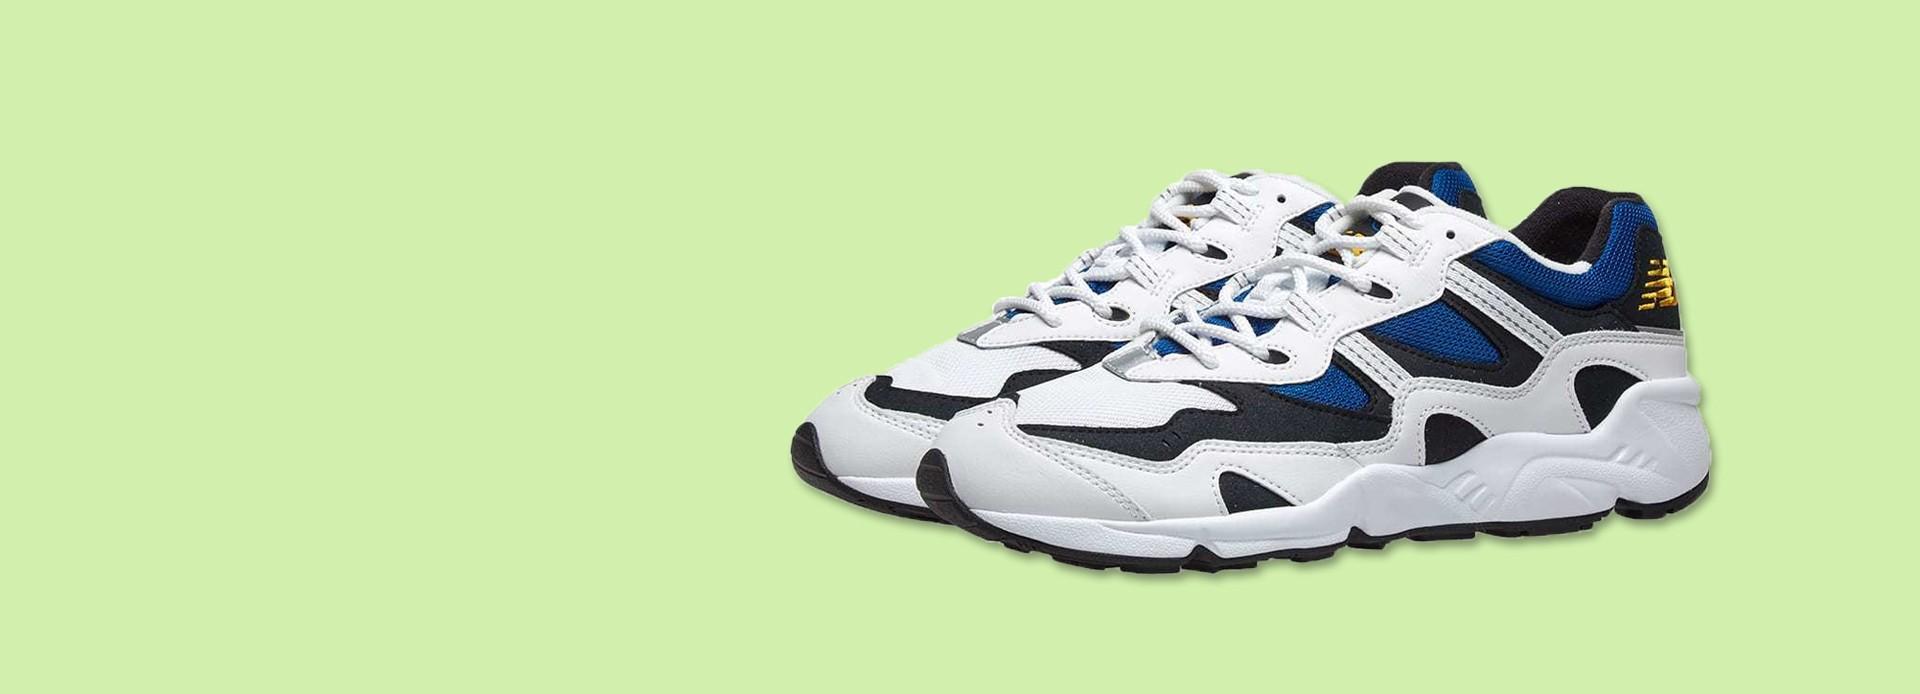 New Balance scarpe sportive da uomo e donna